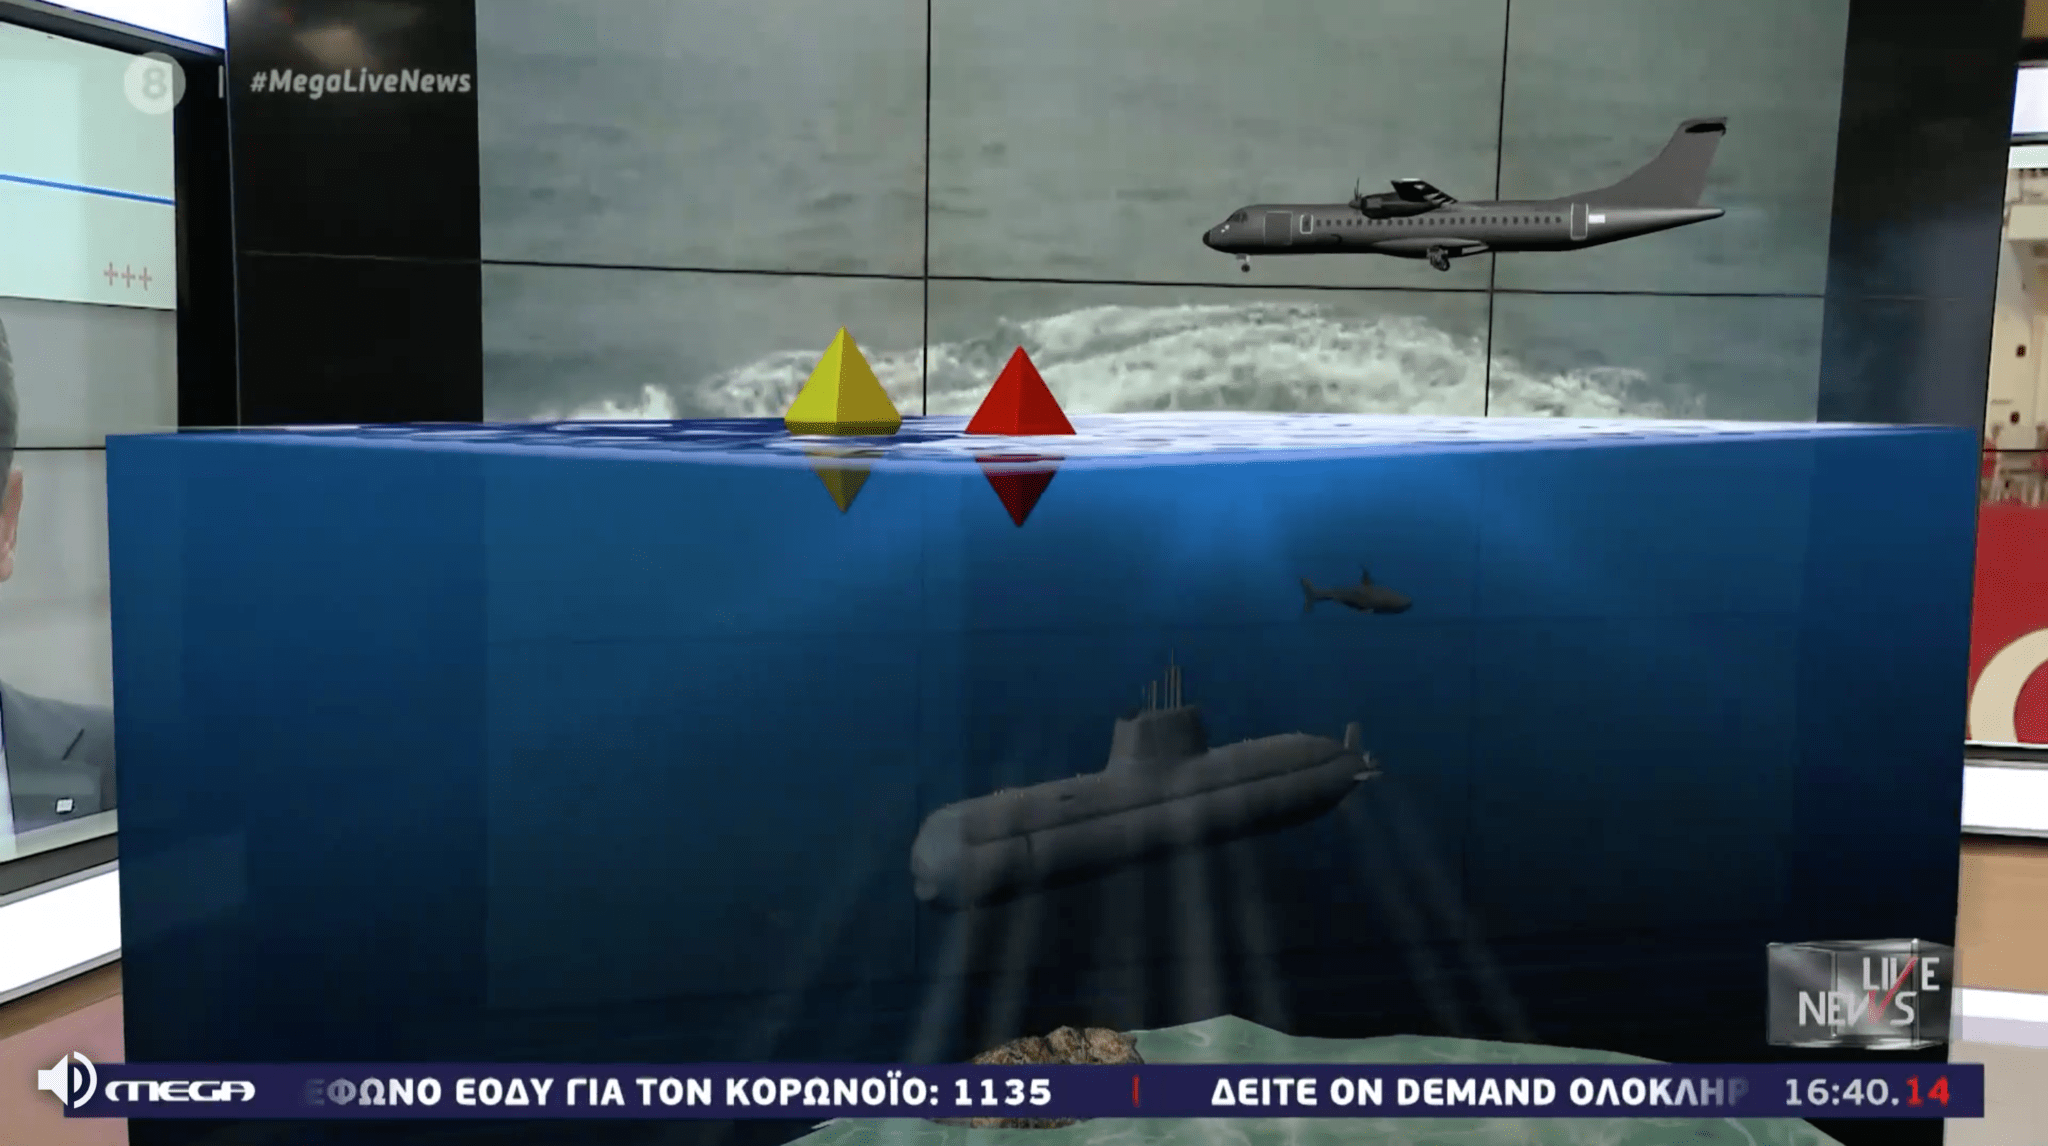 Oruc Reis: Υψηλόβαθμος αξιωματούχος στο πλοίο για να βρει τα ελληνικά υποβρύχια